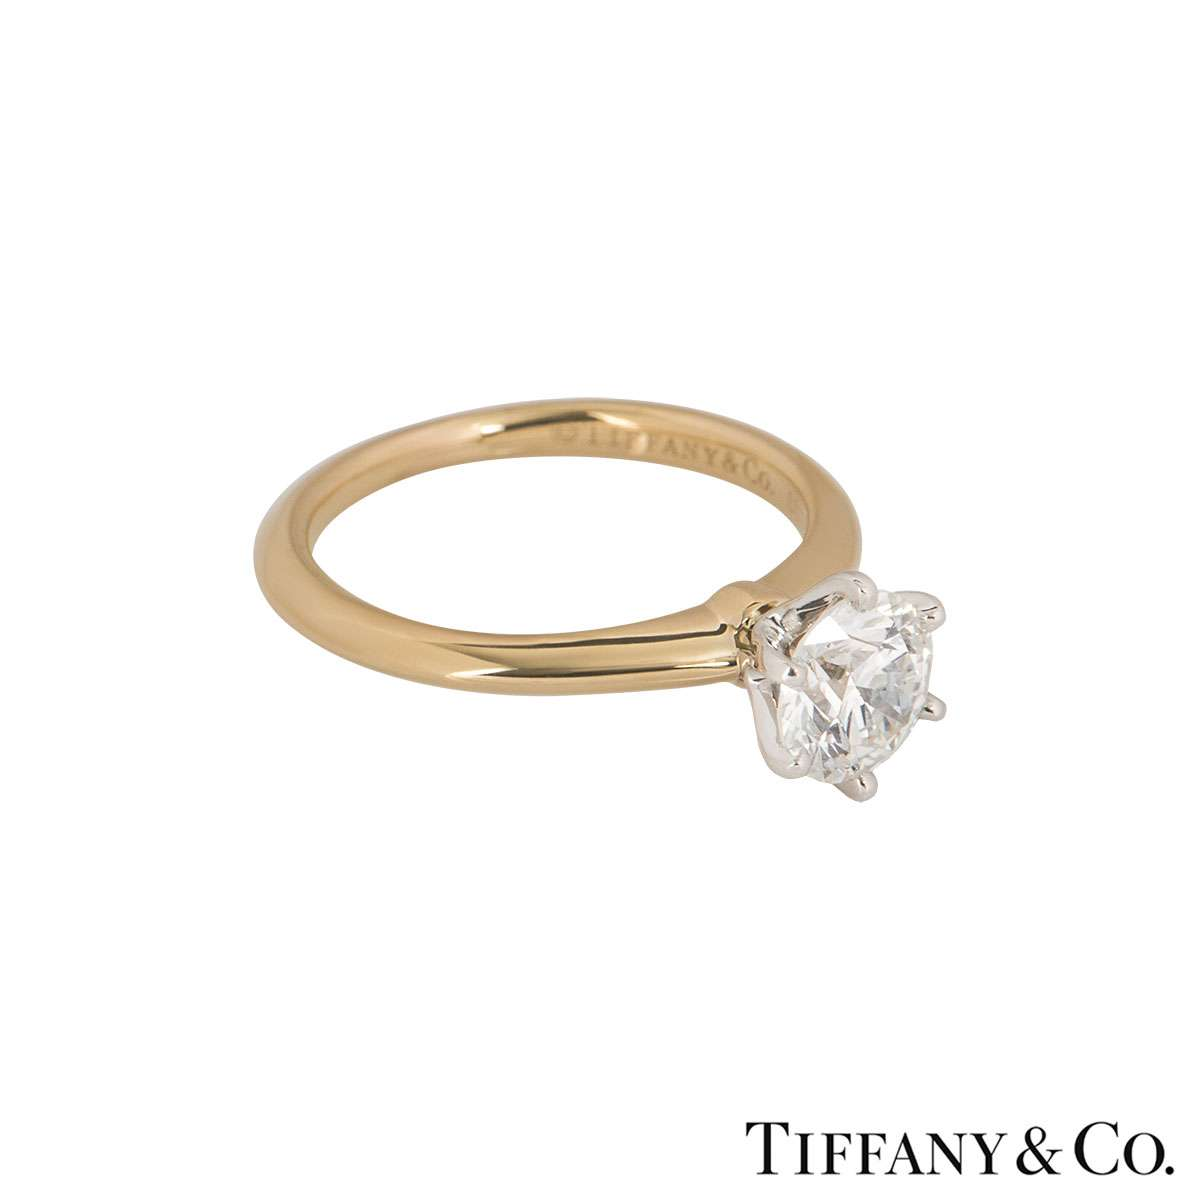 Tiffany & Co. Rose Gold Diamond Setting Ring 0.95ct H/VS1 XXX